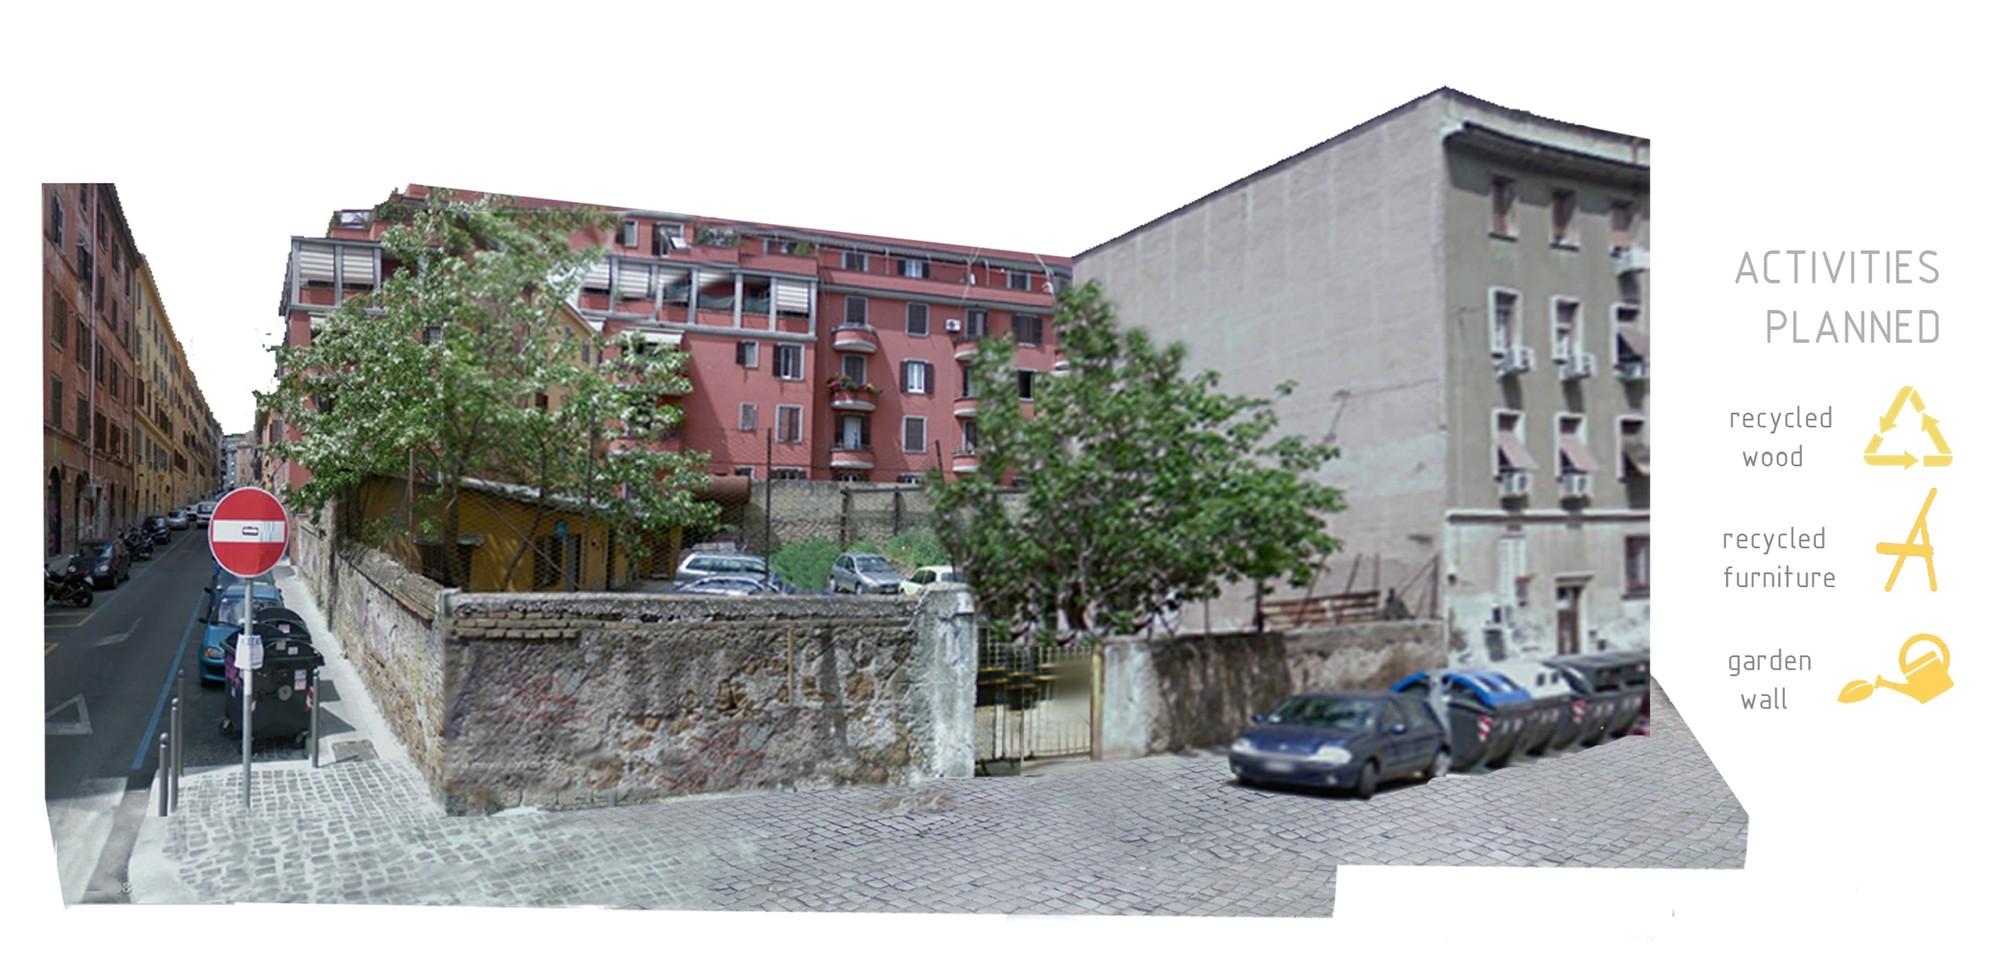 Italia [Antes]. Image Courtesy of Aula de Arquitectura Social AAS UCAM